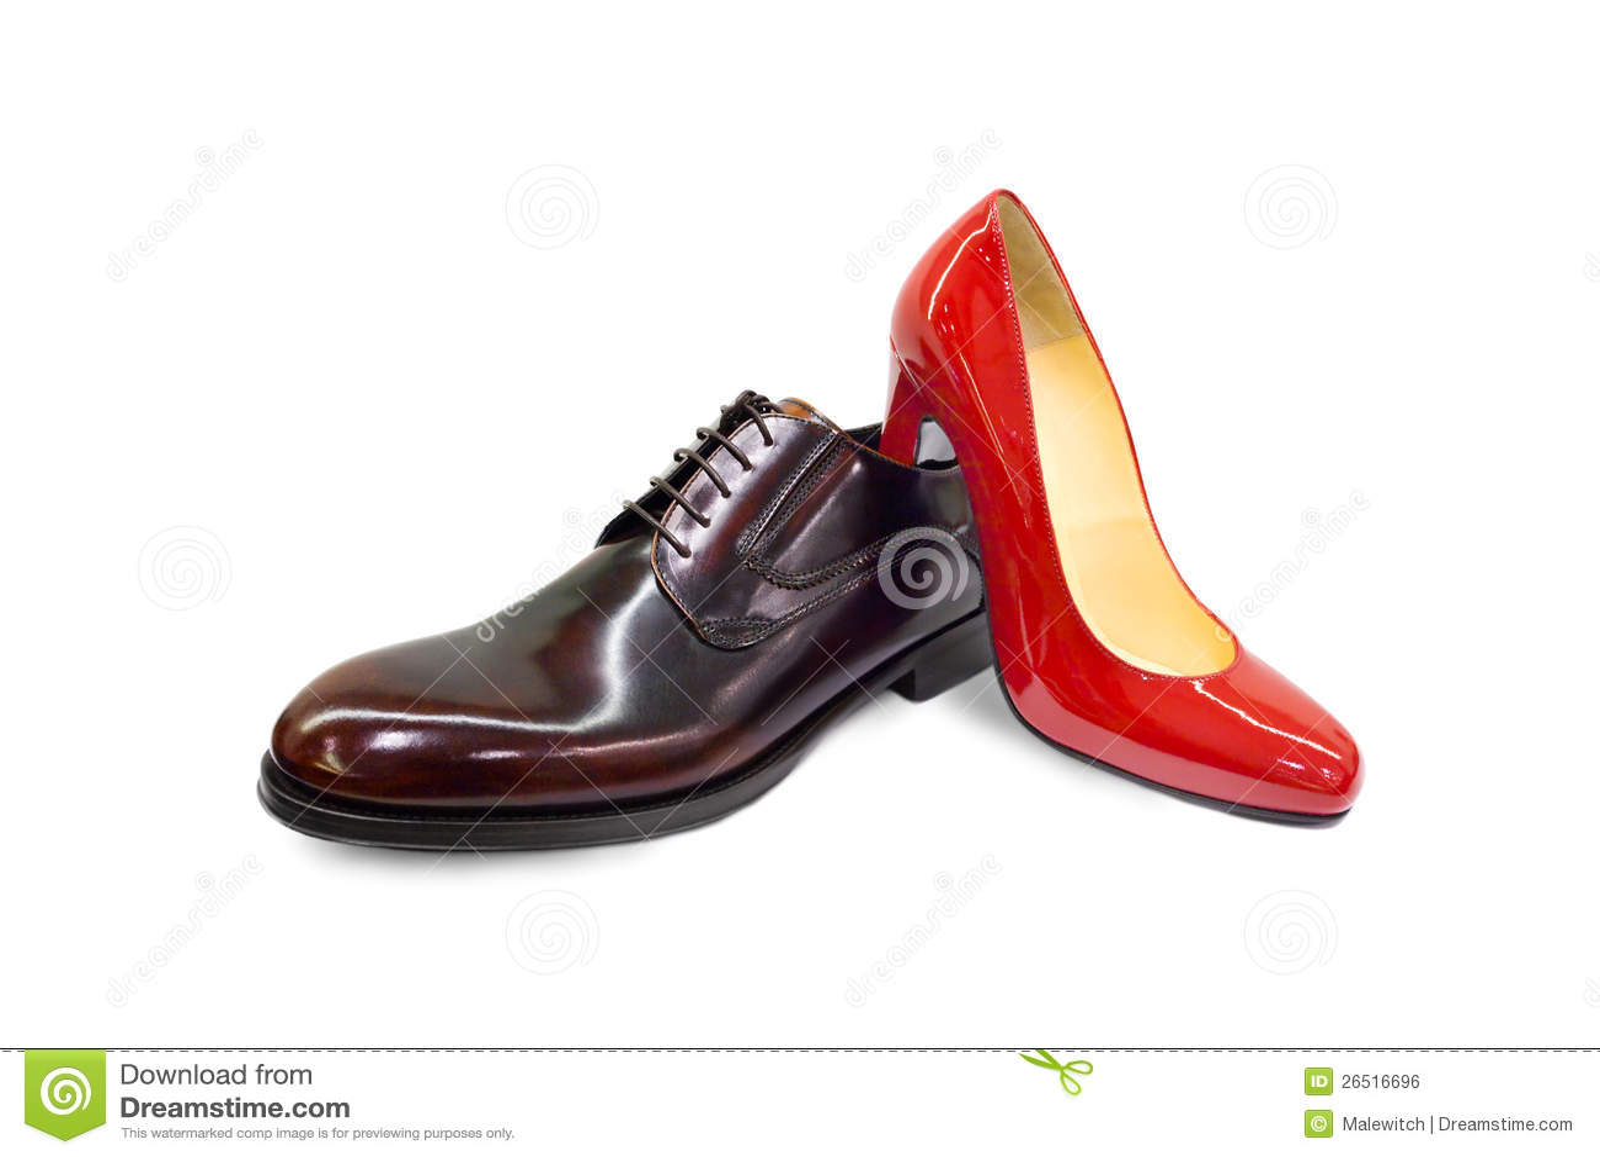 Male&female shoes-5